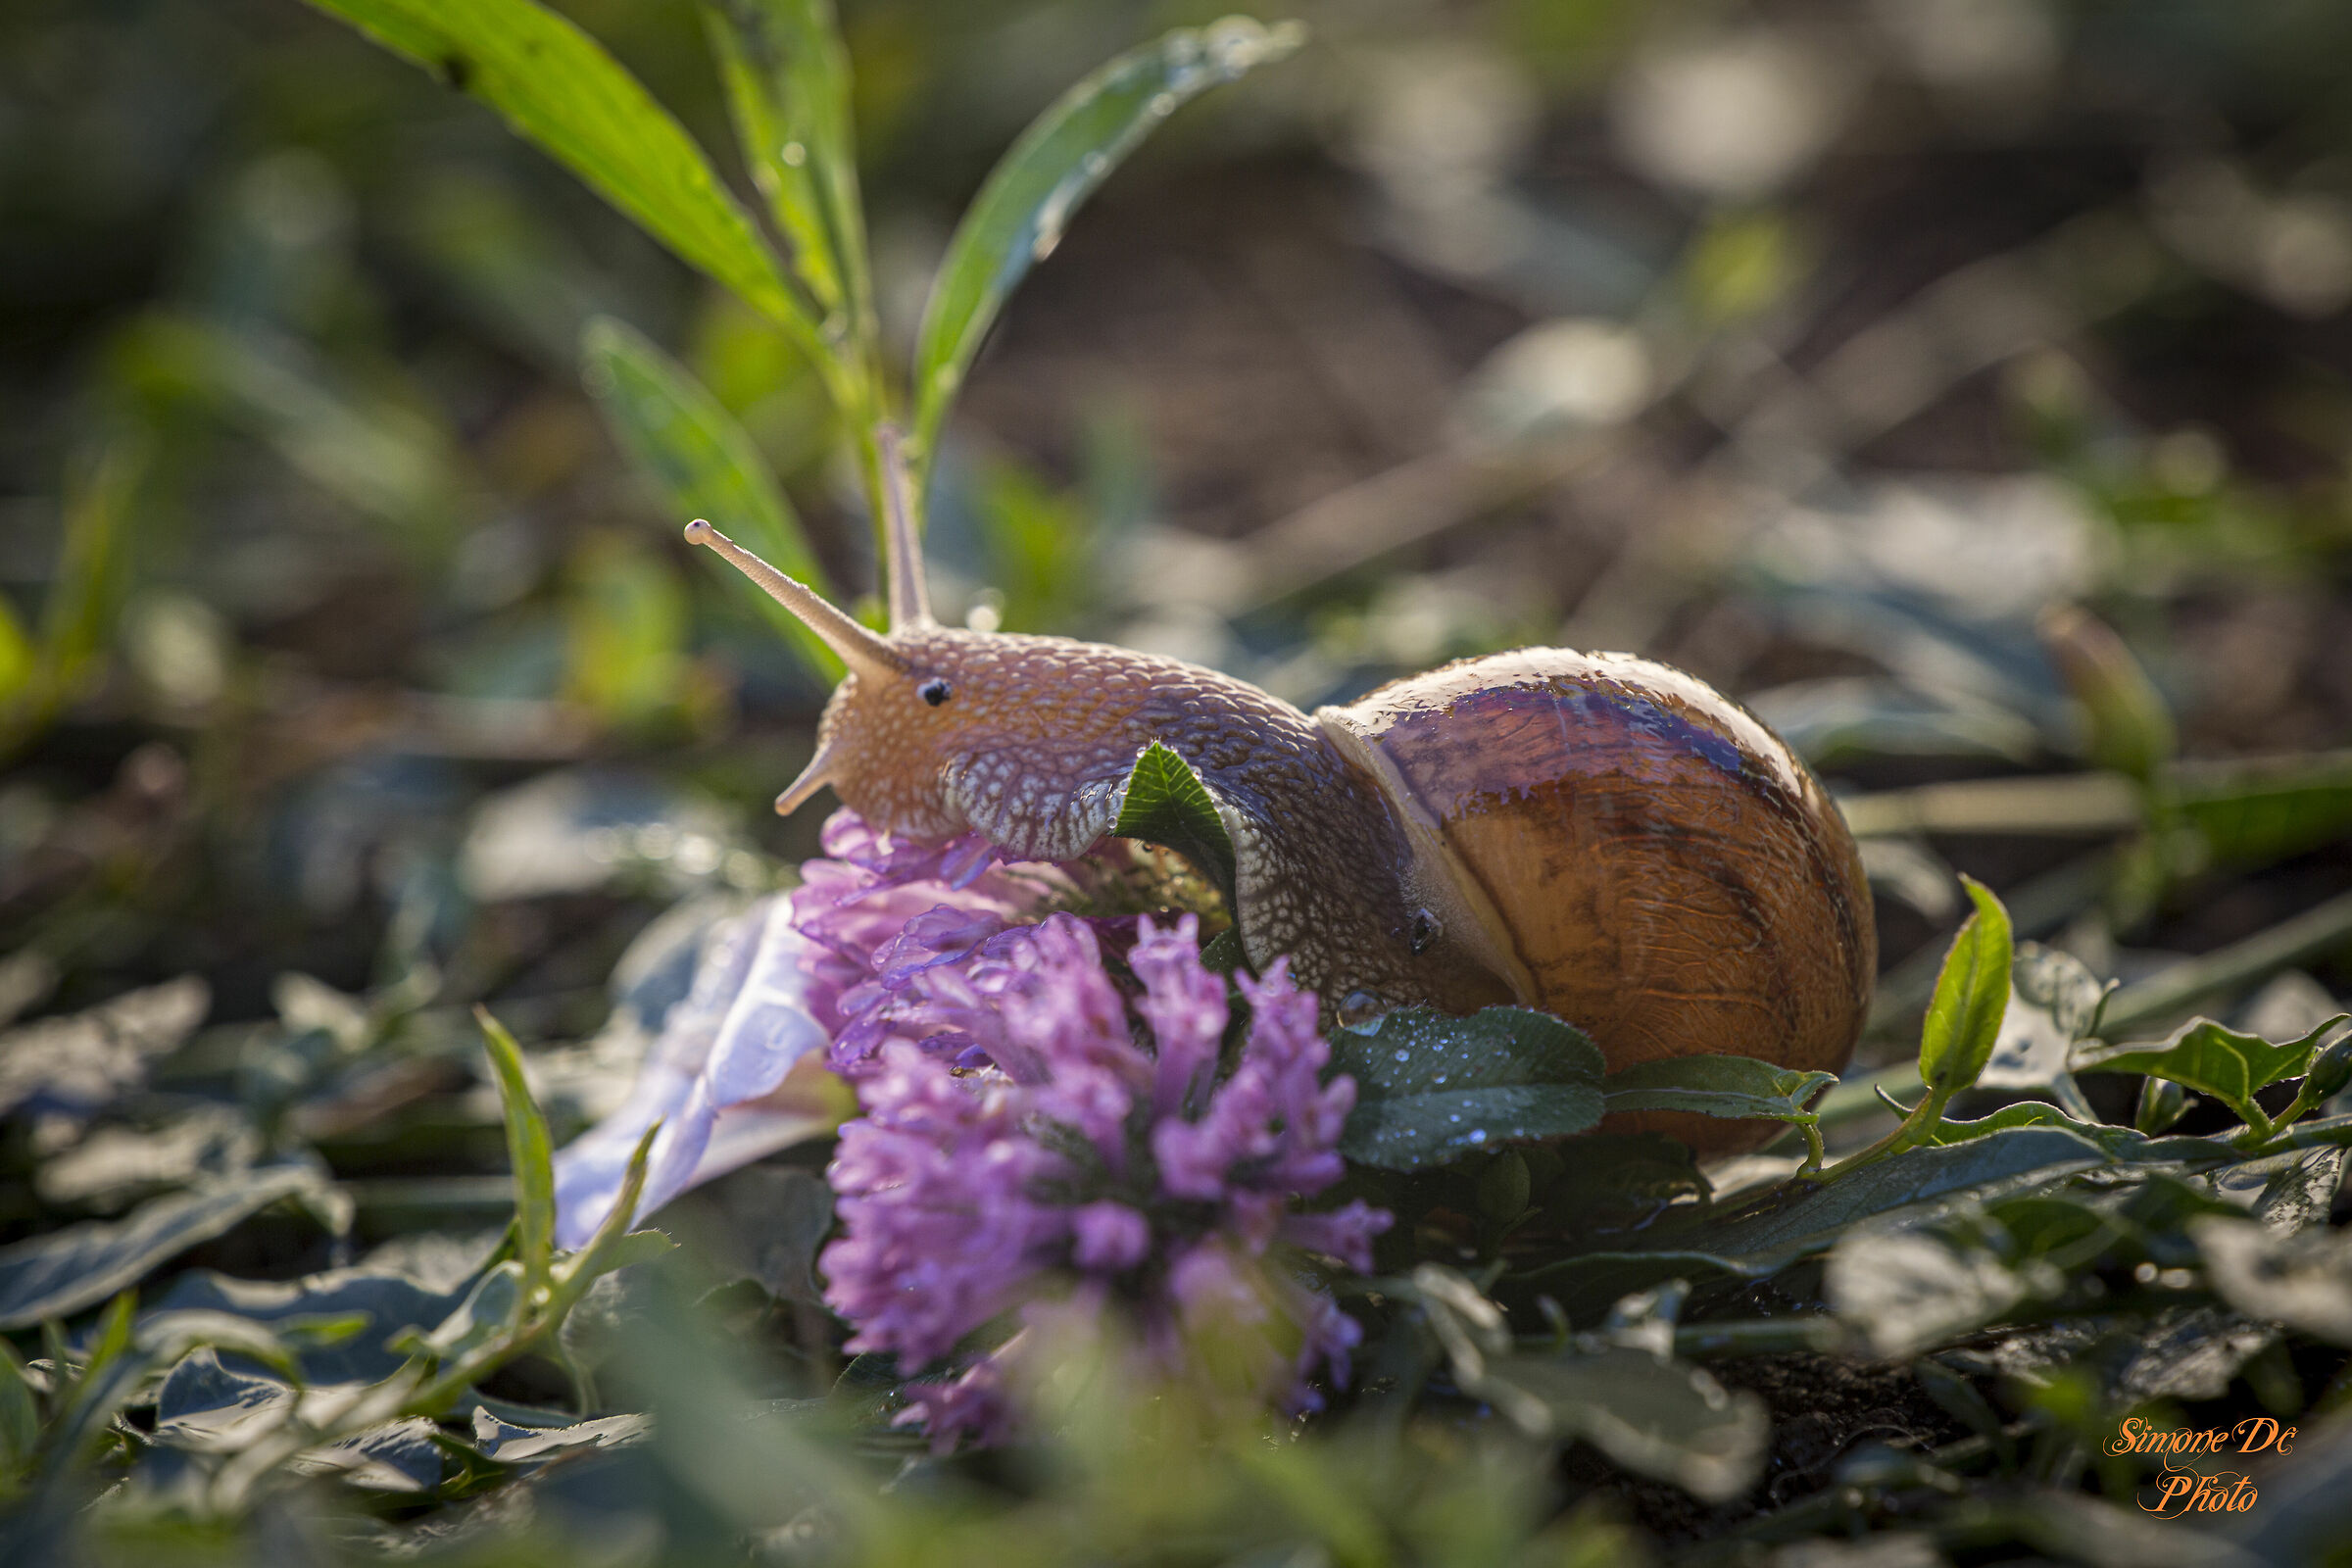 lumaca nei fiori viola...